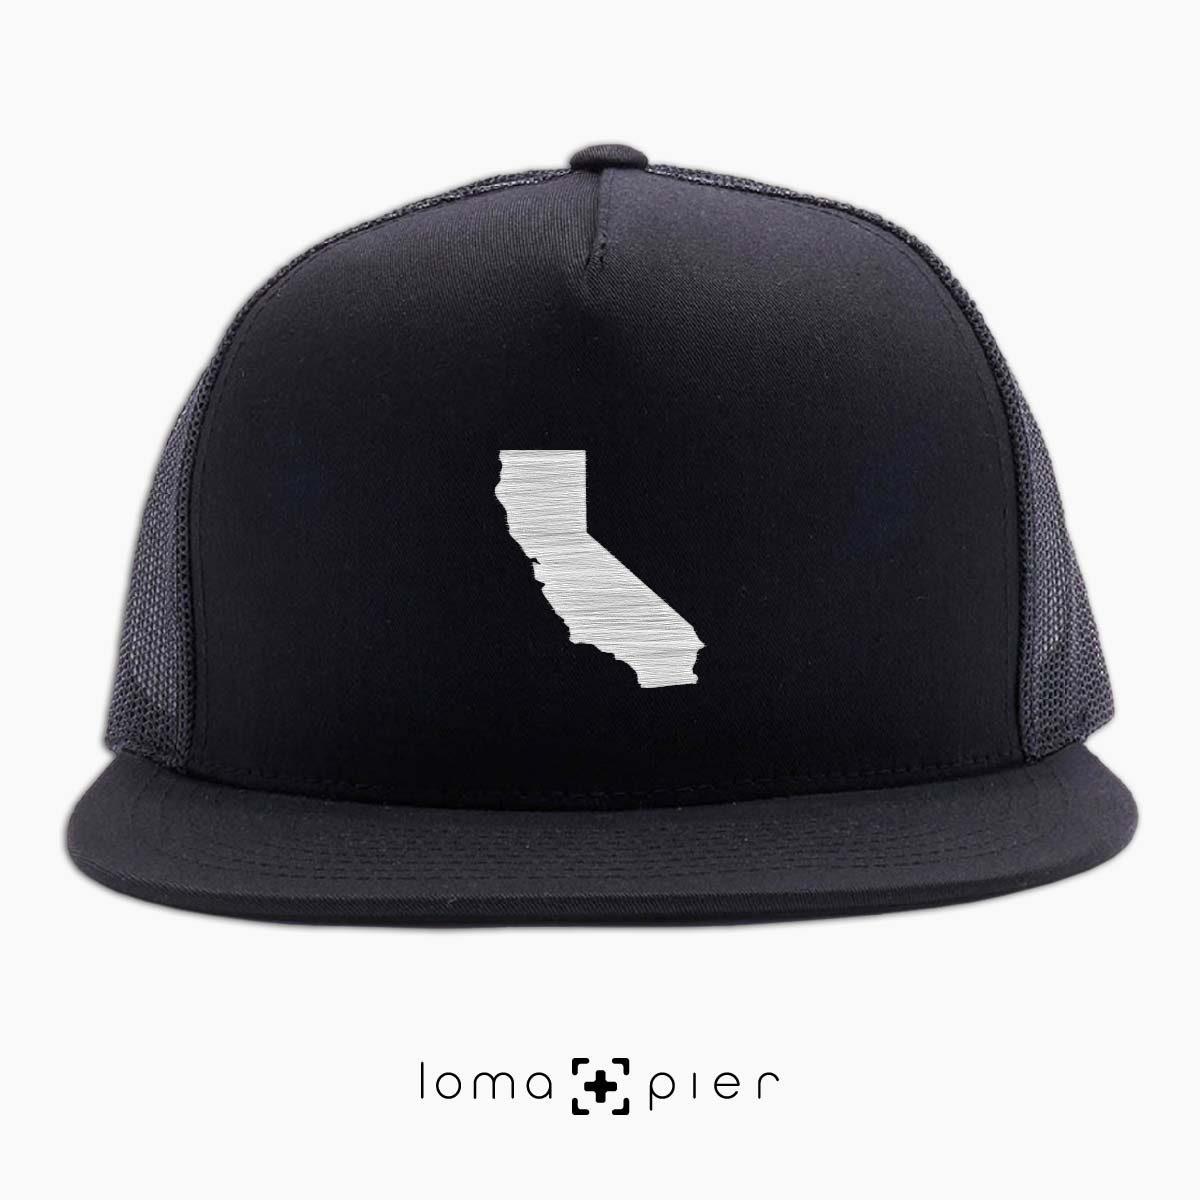 CALIFORNIA icon beach netback trucker hat in black by loma+pier hat store